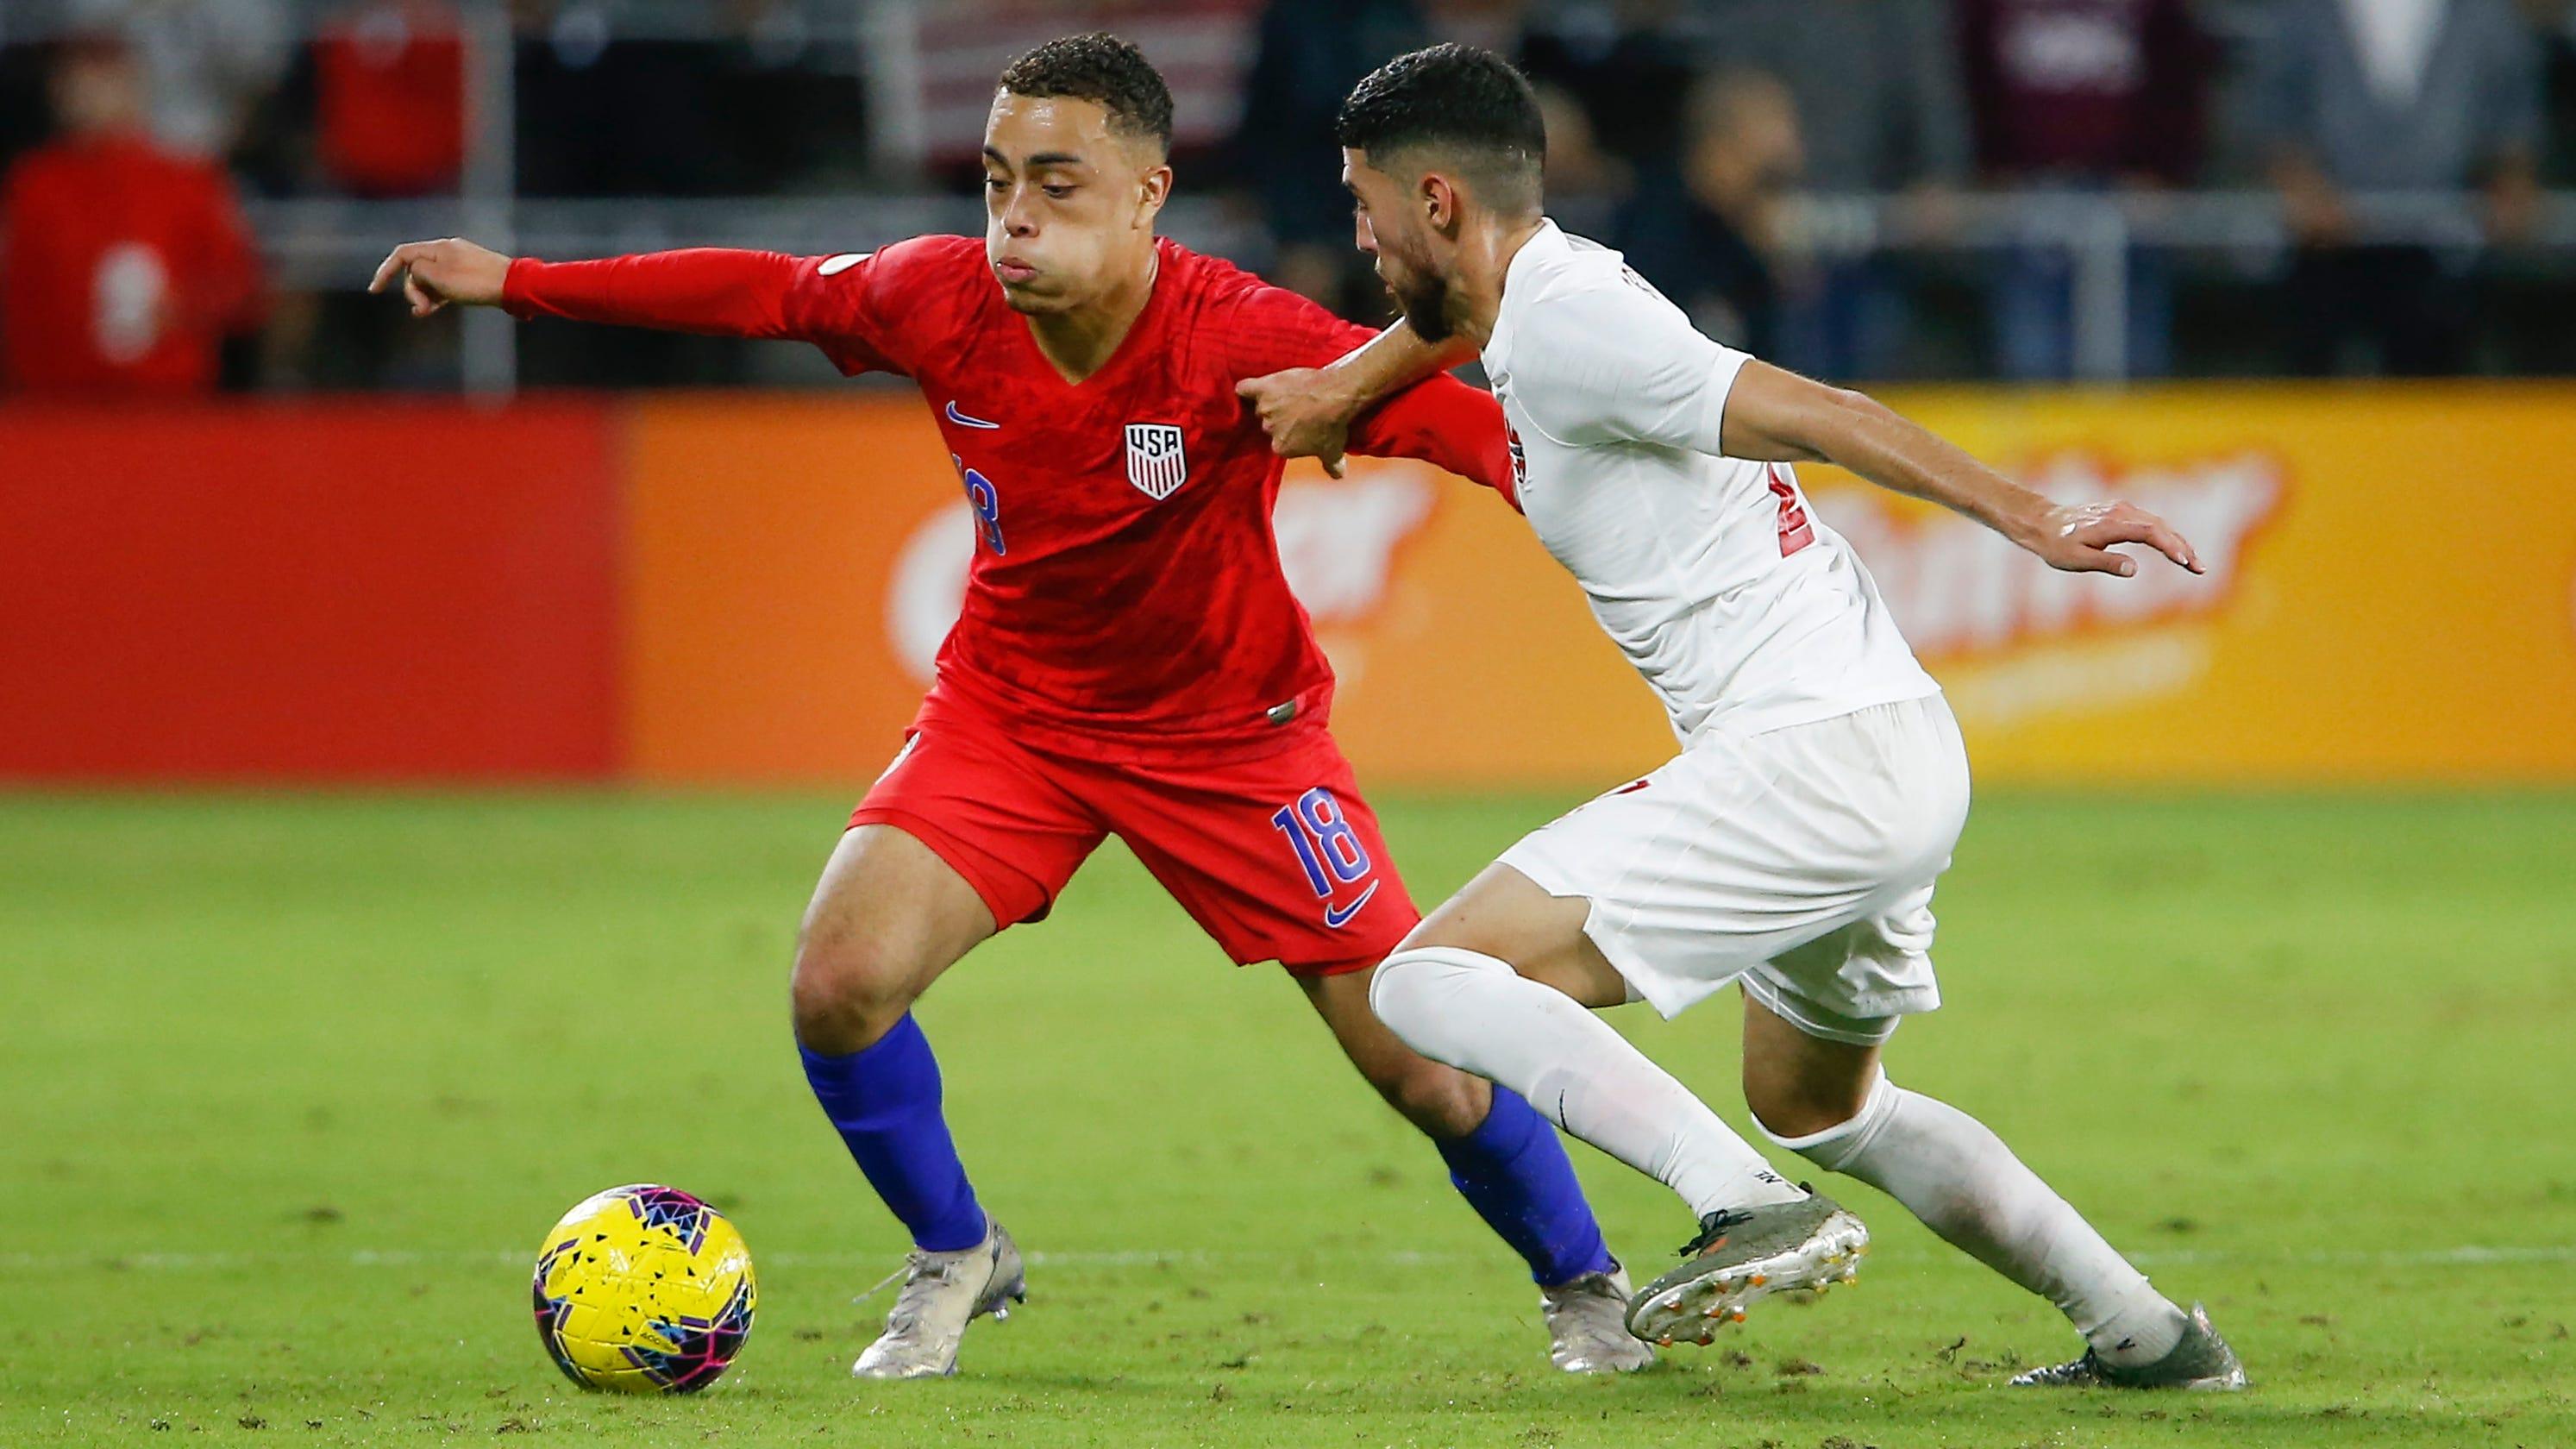 Barcelona signs American teenager Sergino Dest